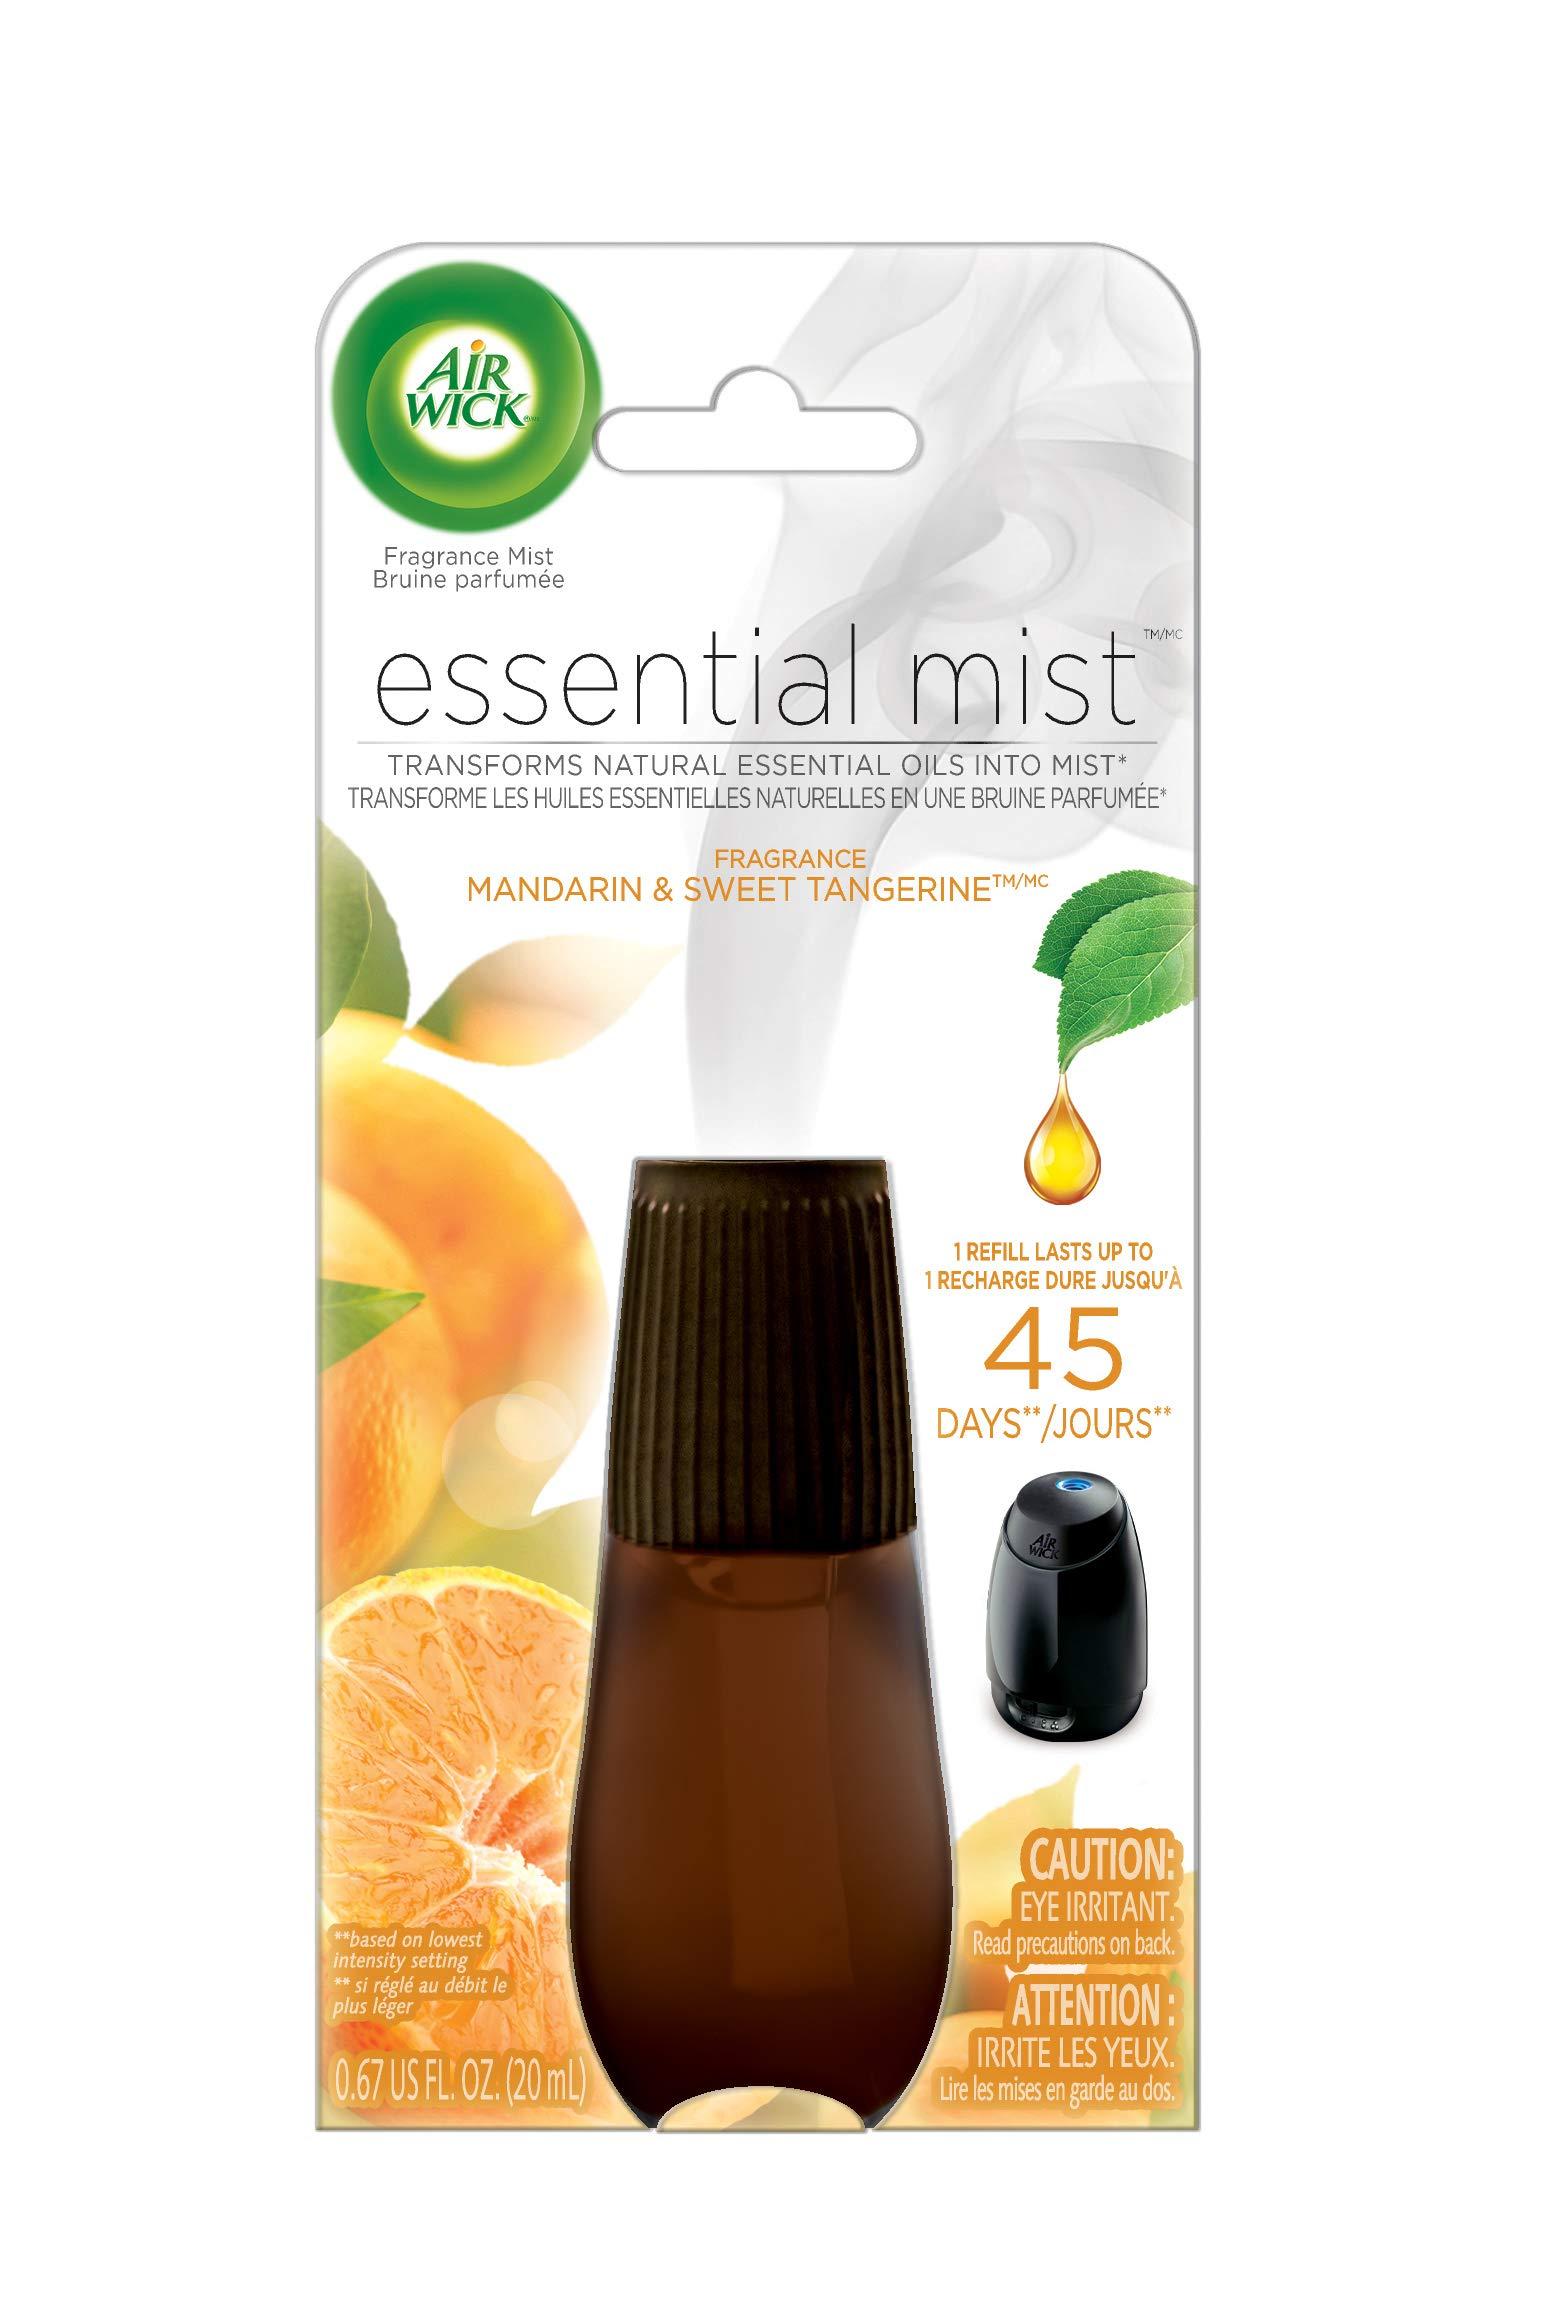 Air Wick Essential Oils Diffuser Mist Refill, Mandarin & Sweet Orange, 1ct, Air Freshener